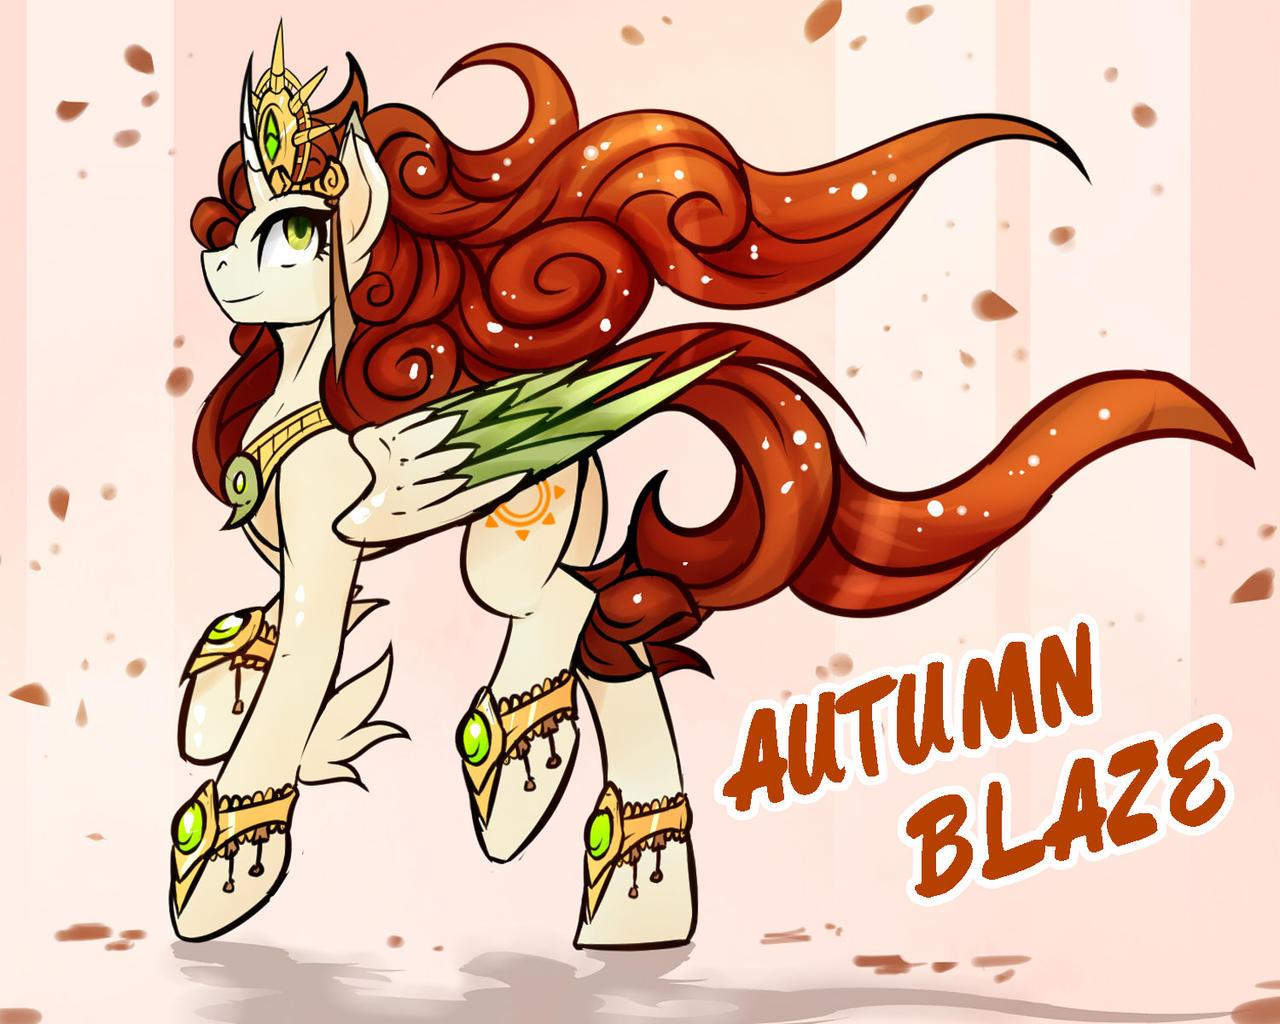 [MLP] RACESWAP - Alicorn Autumn Blaze by MrWh0ever